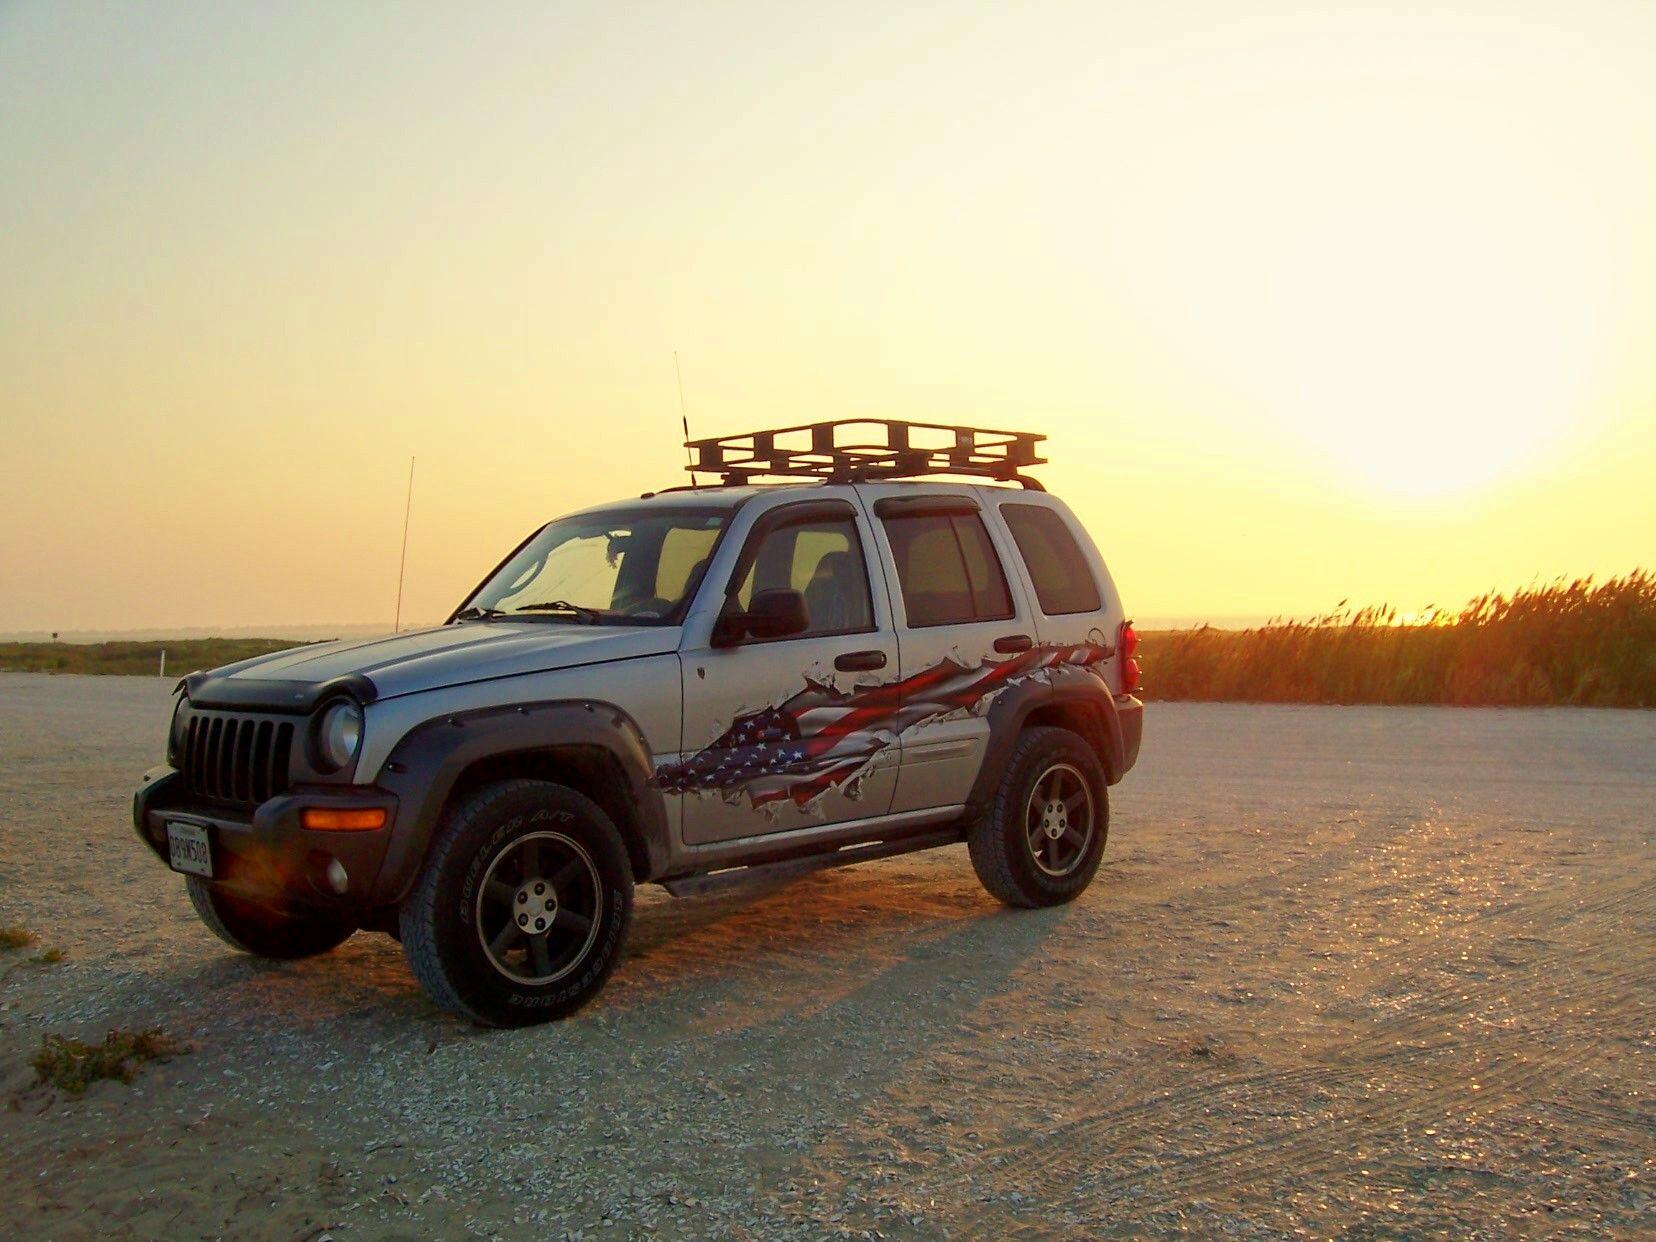 My 2003 Jeep Liberty Freedom Edition